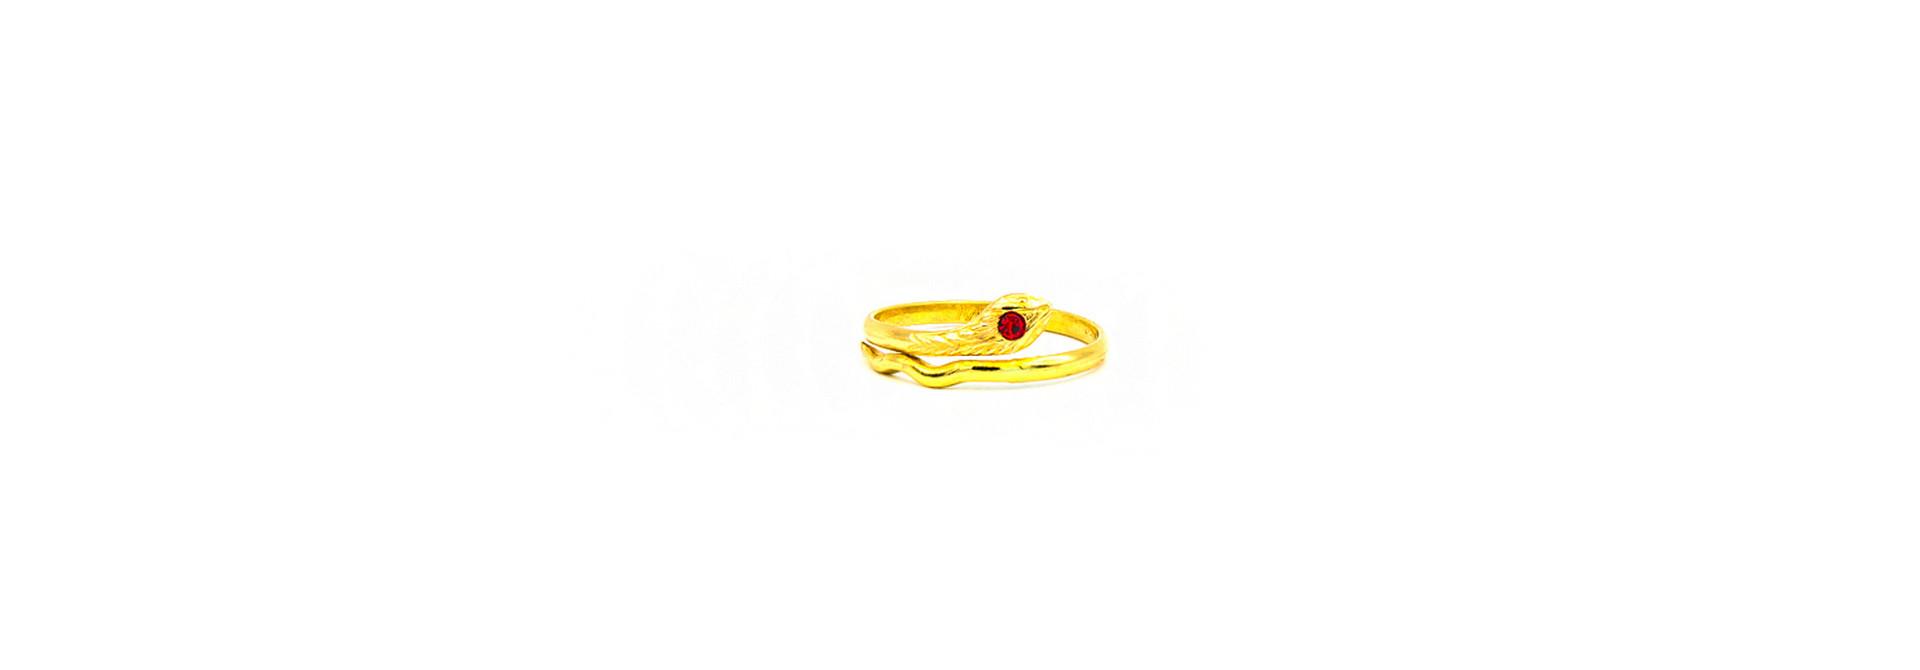 Ring met slang en rode zirkonia